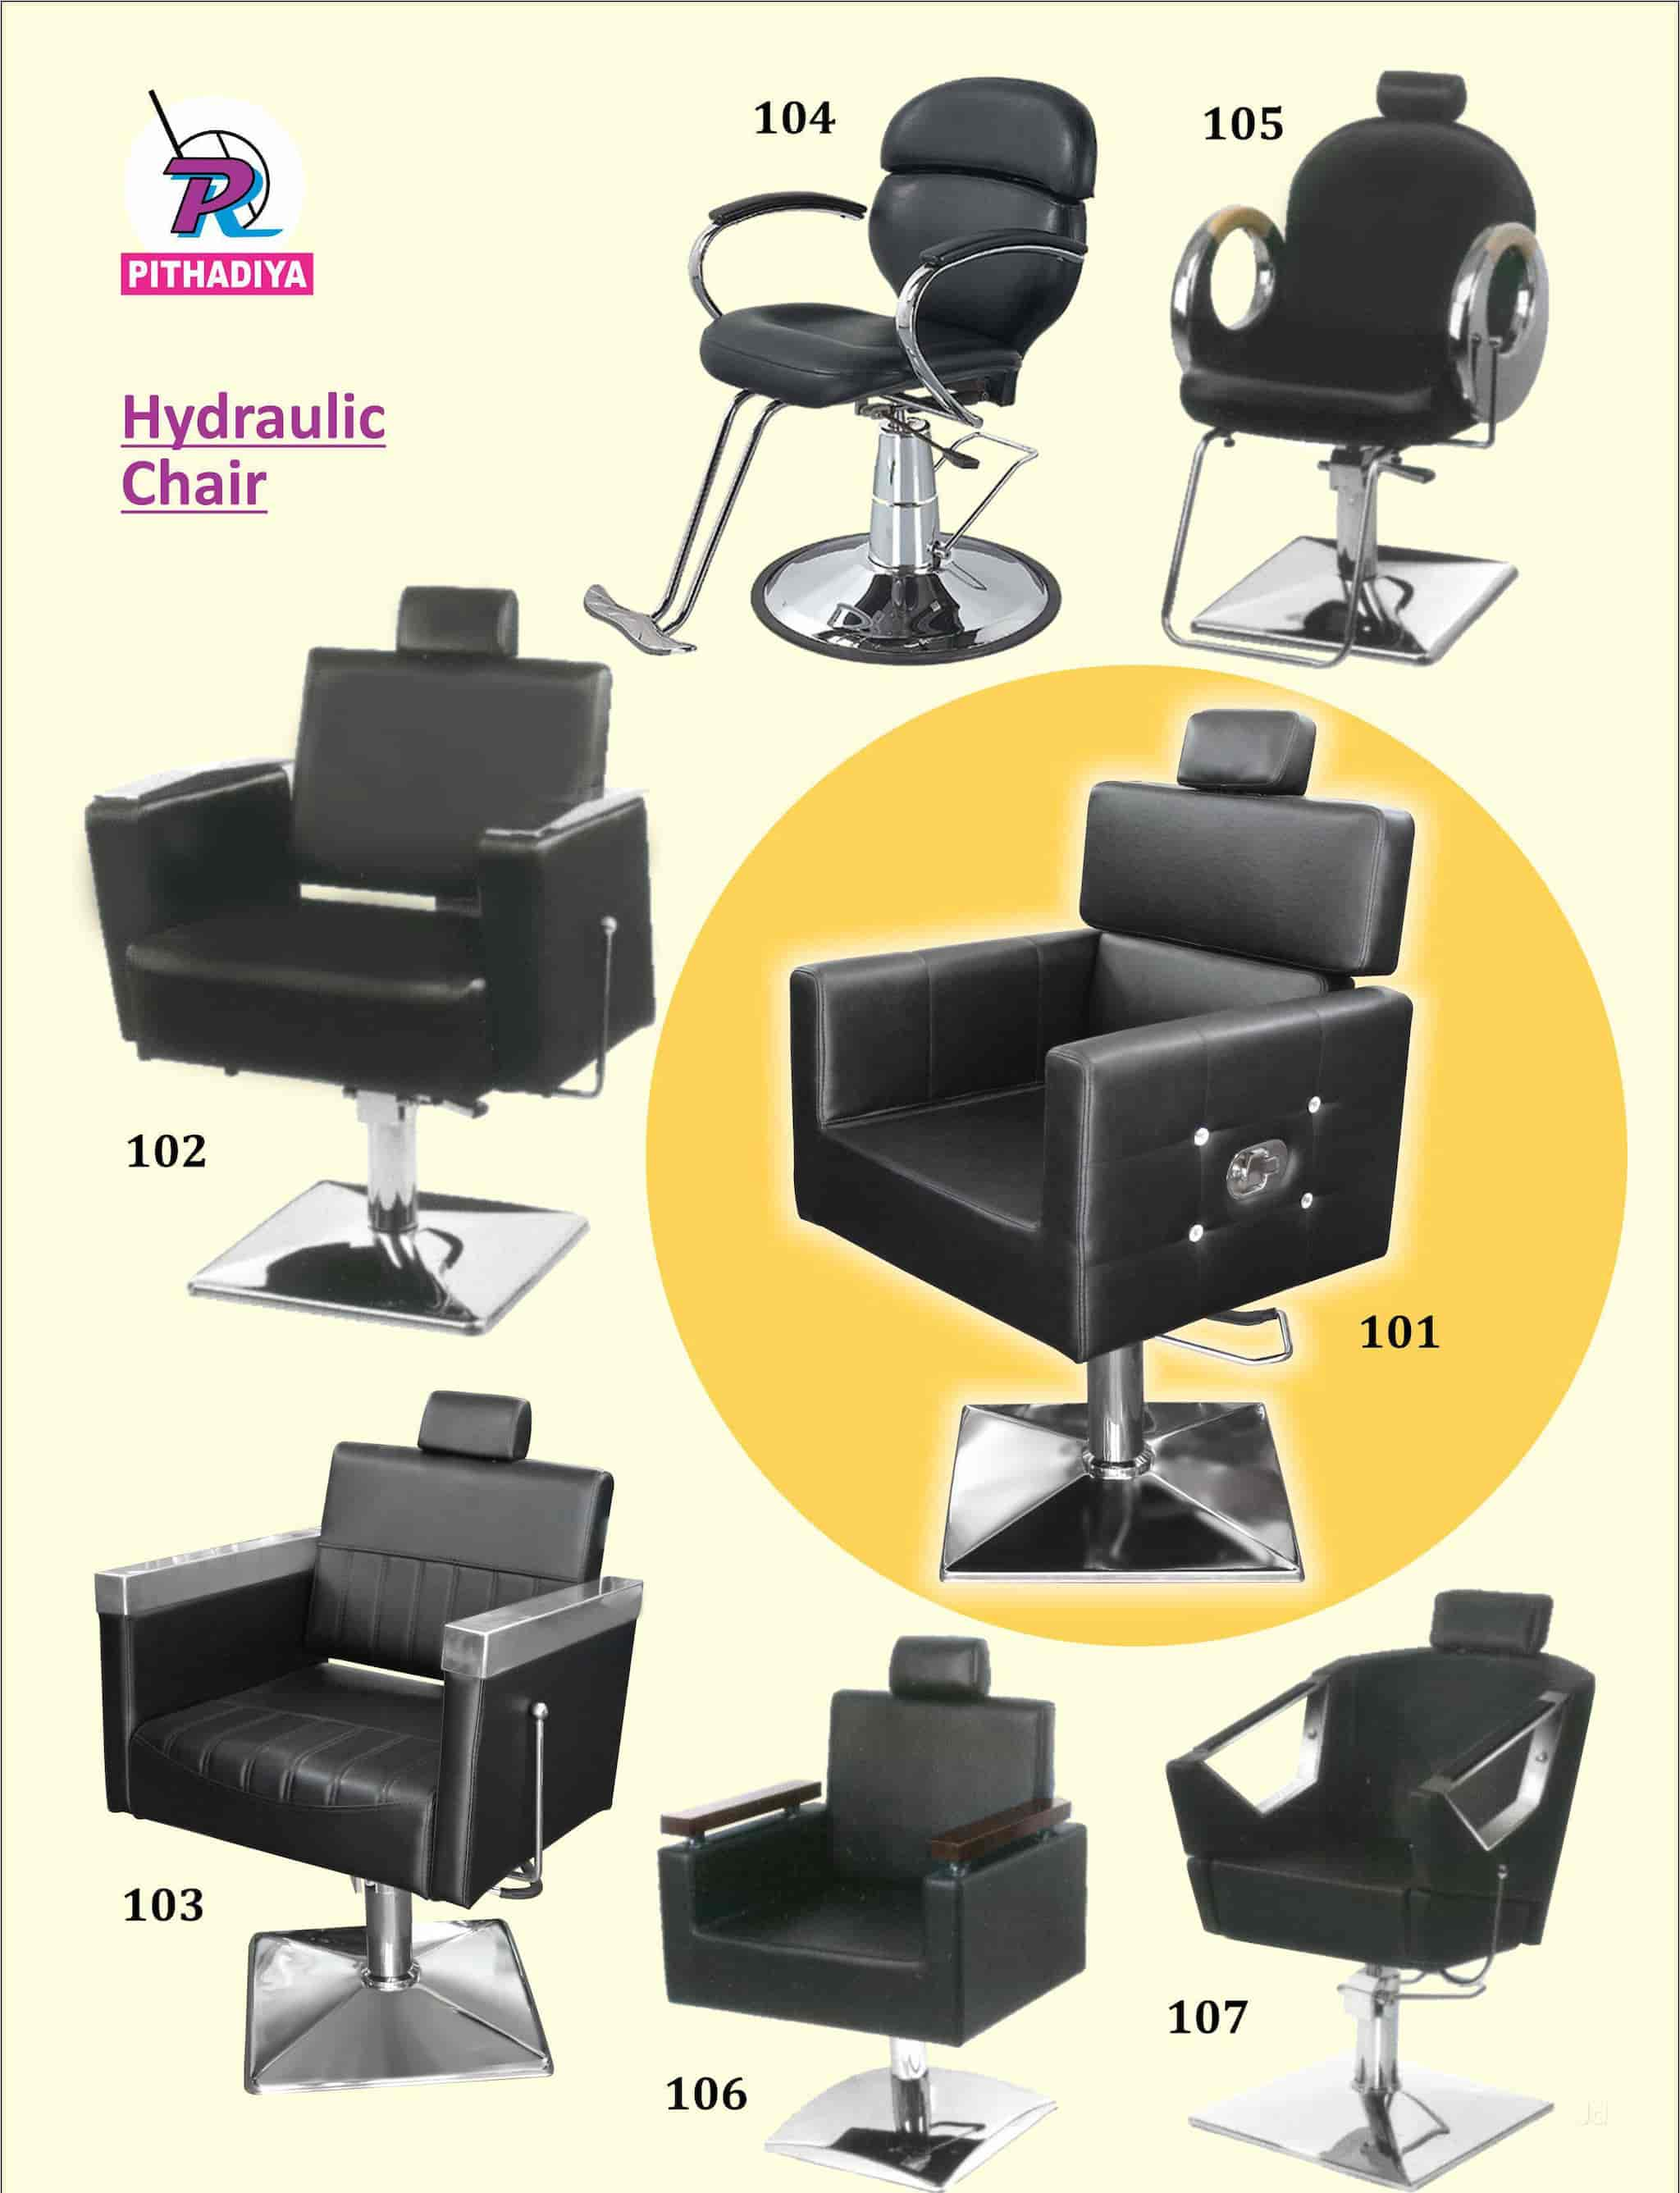 r d pithadiya gheekanta salon chair dealers in ahmedabad justdial